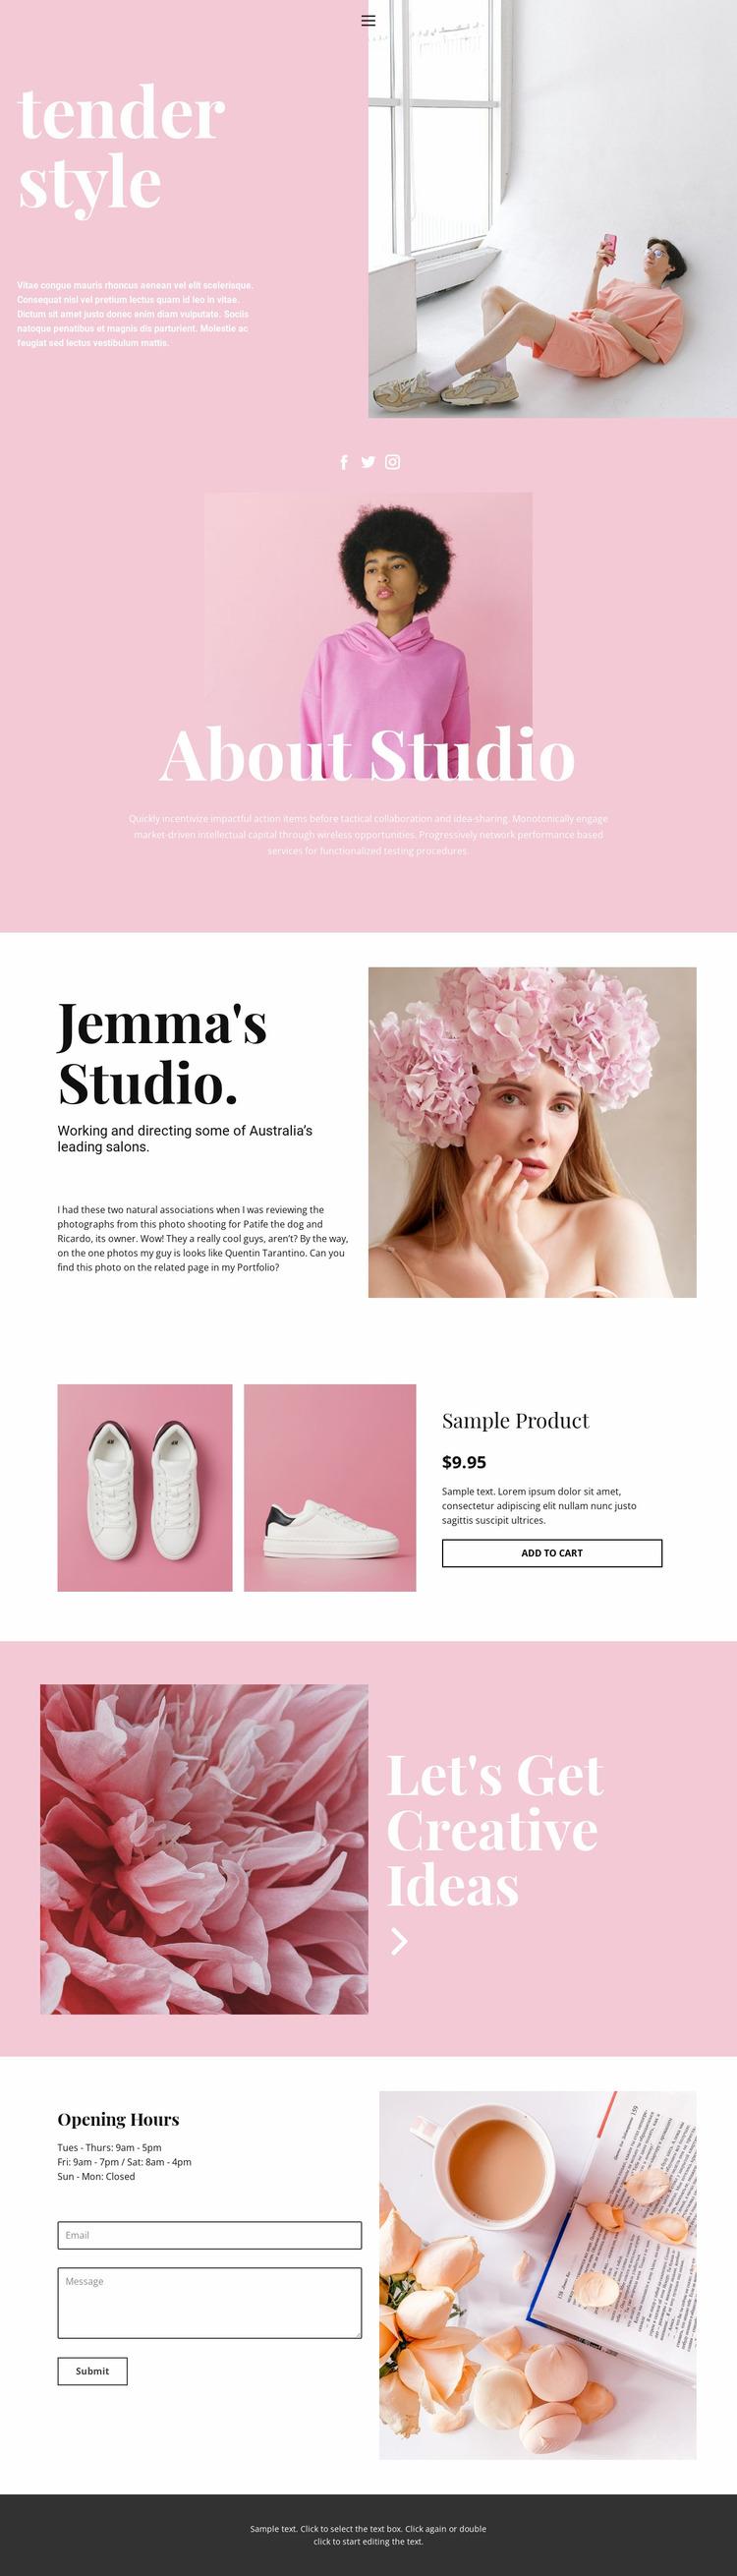 Fashion news Website Mockup